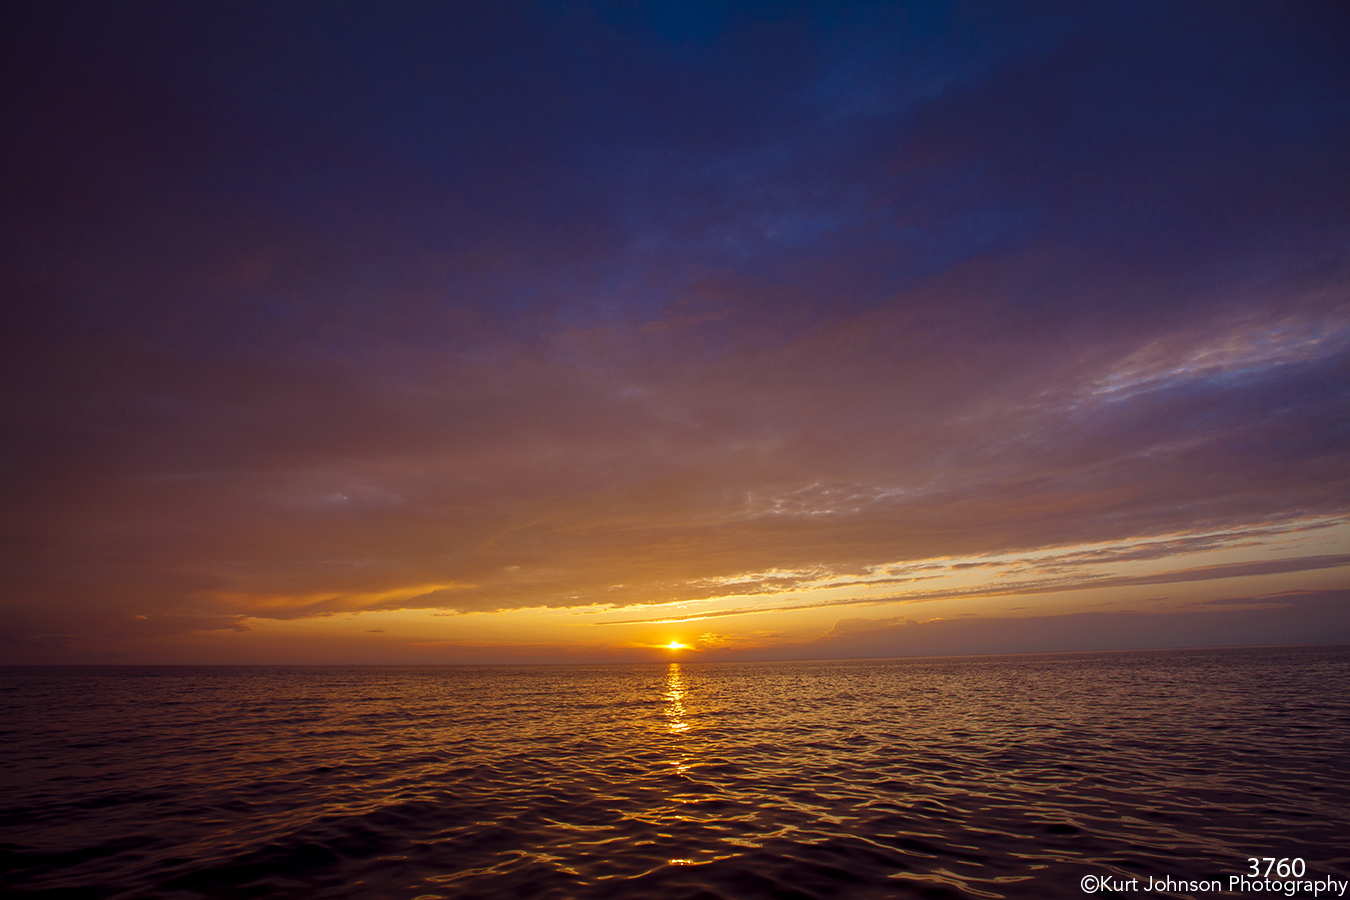 waterscape sunset waves clouds sky purple ocean